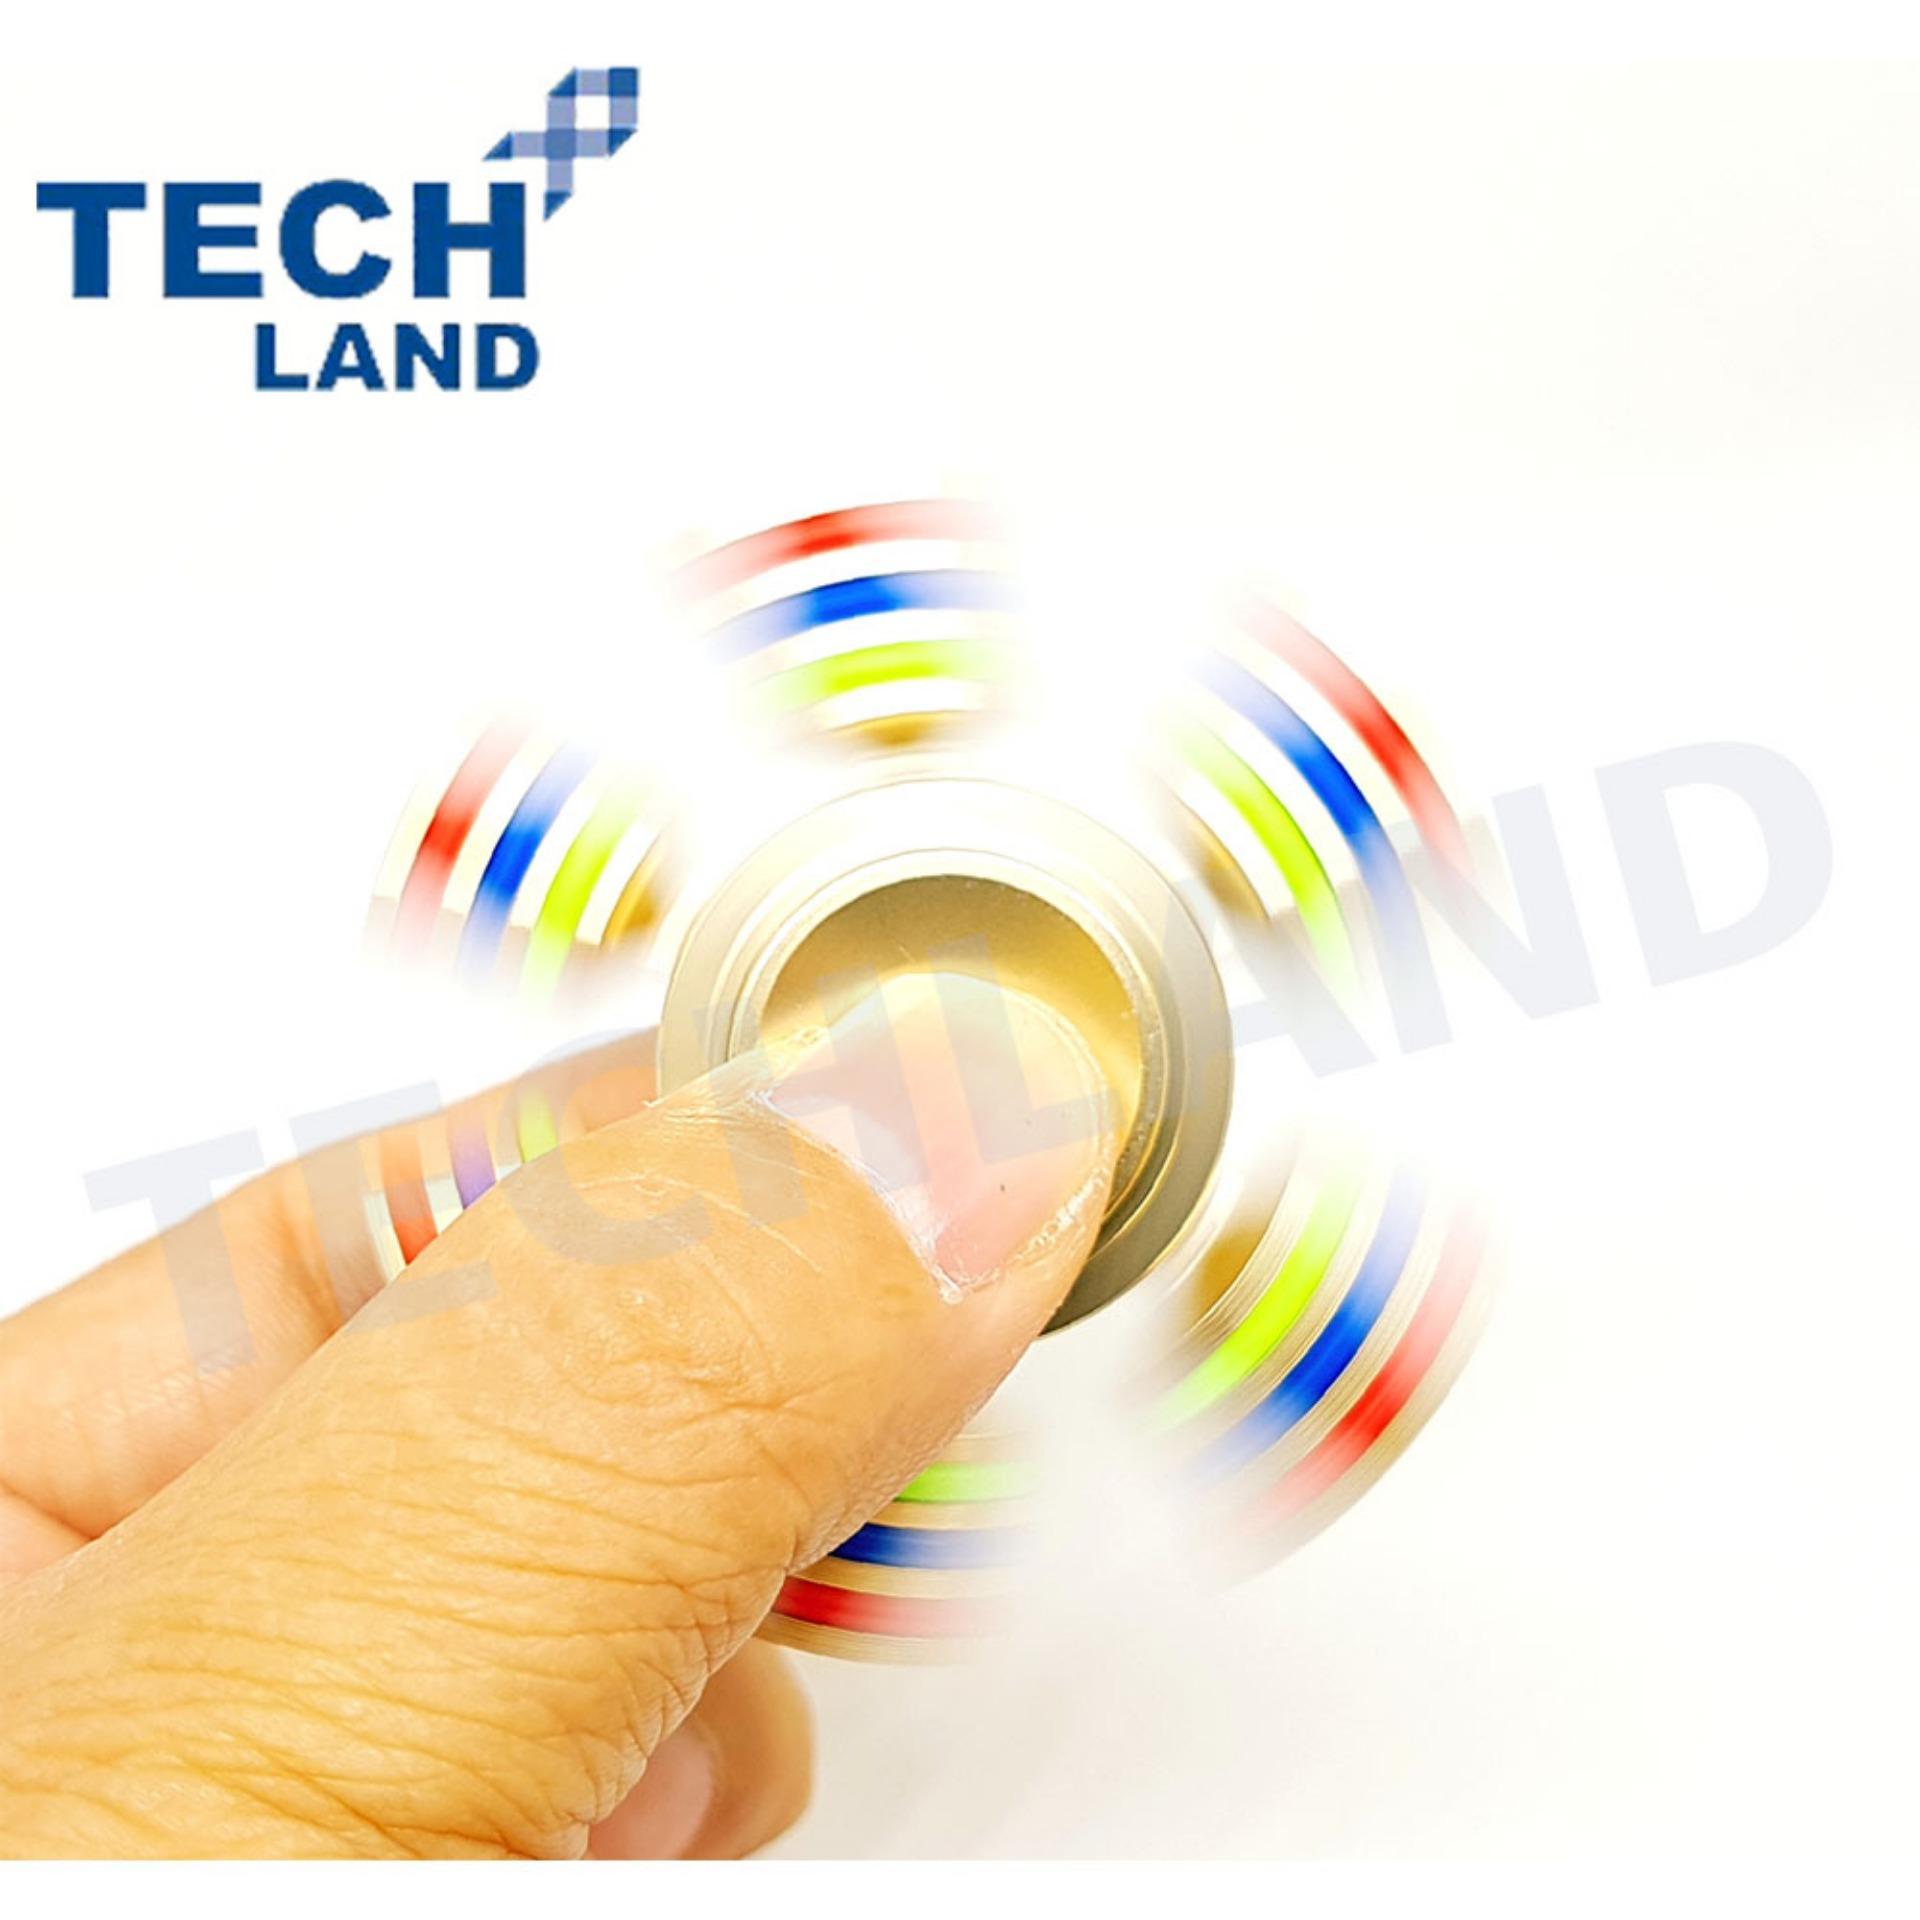 Fidget Spinner Hand Techland Premium Quality Brass Hybrid Triangle Bearing Keramik Ceramic Toys Focus